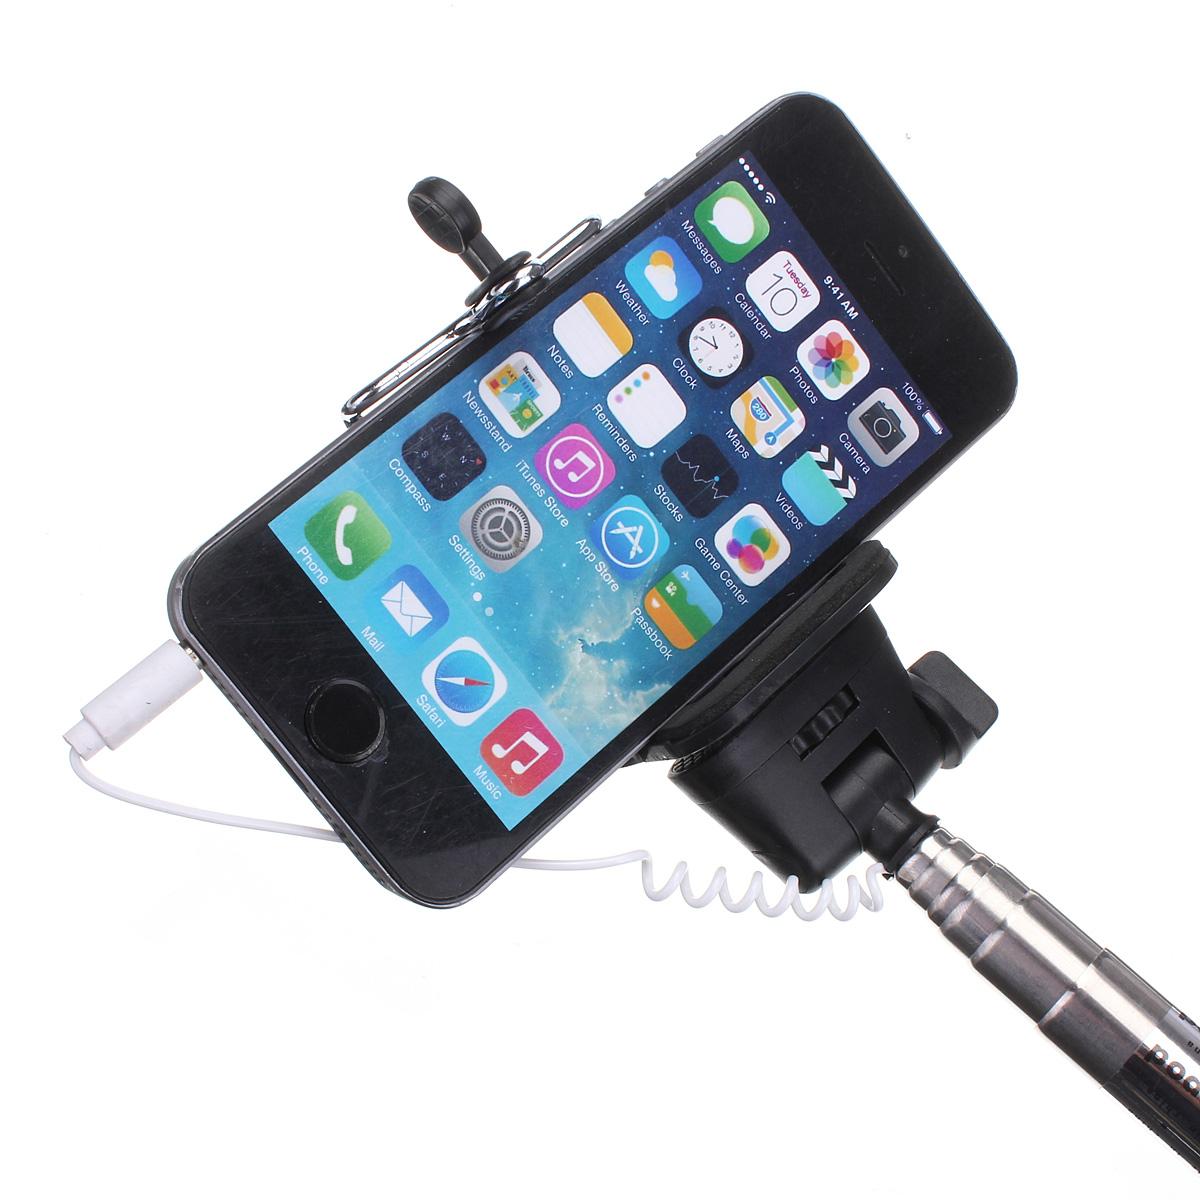 telescopic handheld monopod selfie stick for iphone 6 6 plus sony htc lg moto pink. Black Bedroom Furniture Sets. Home Design Ideas